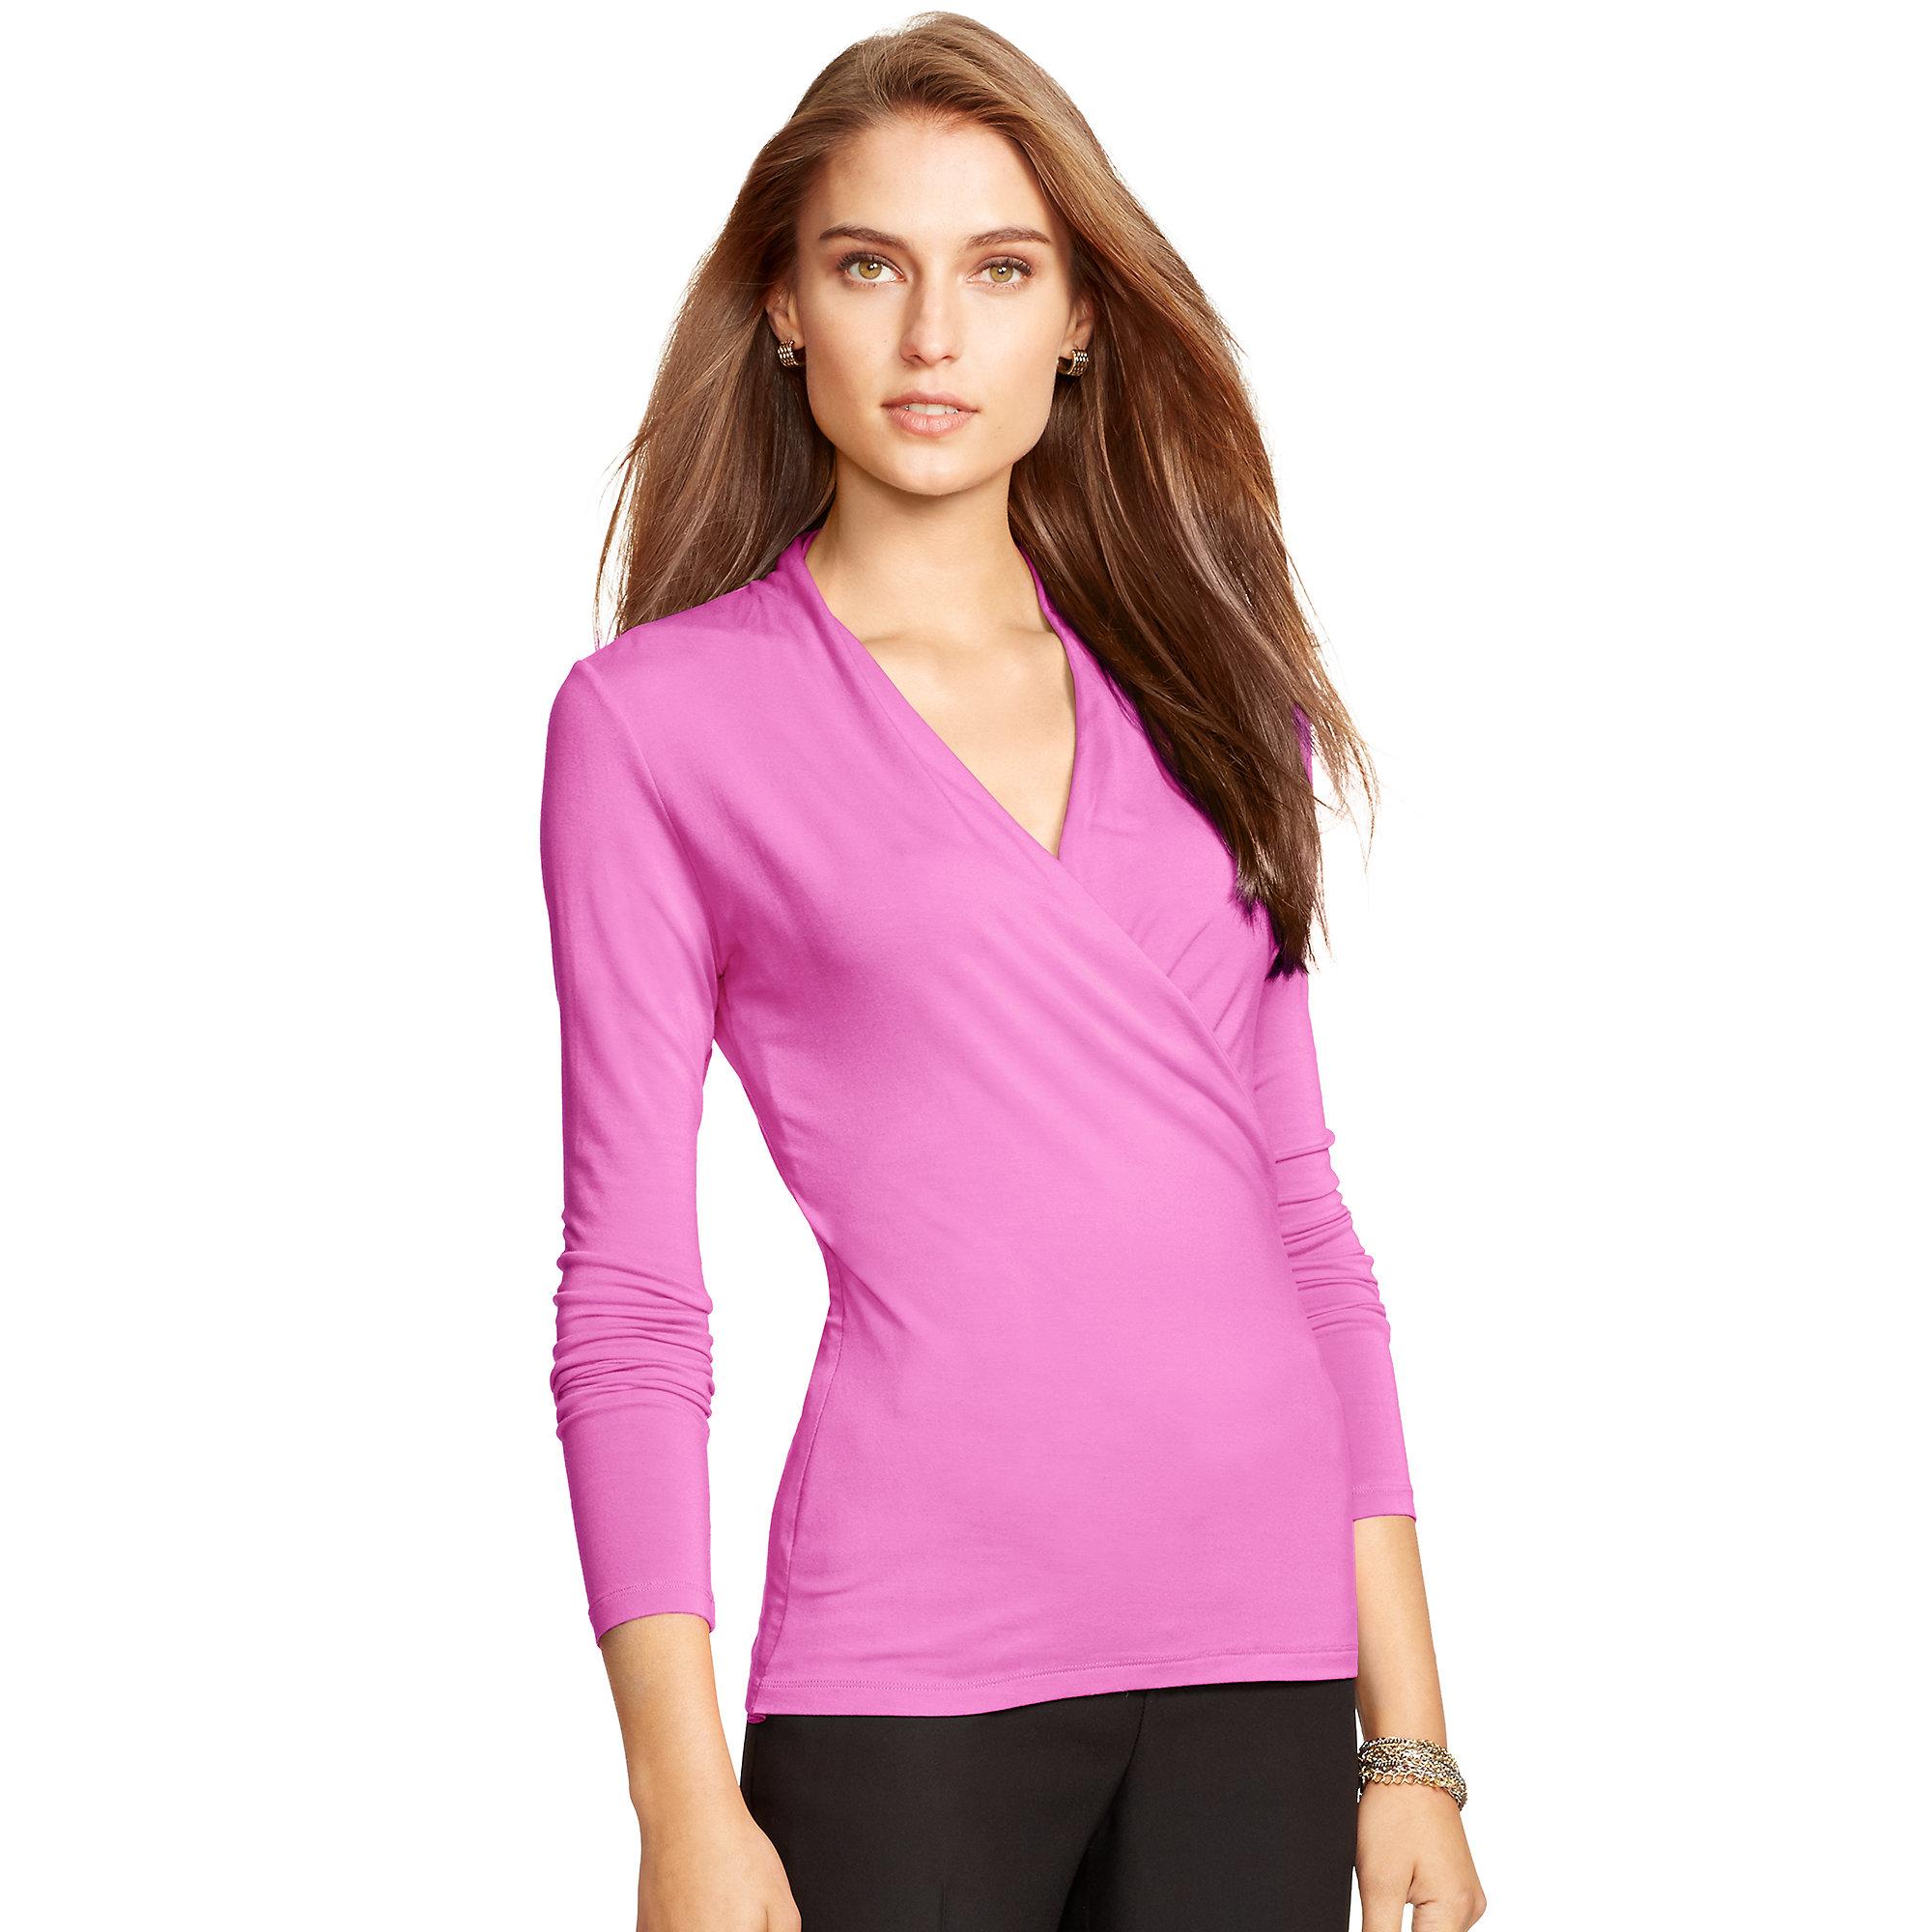 98048ce186ae7e Lyst - Ralph Lauren Jersey Surplice Top in Pink